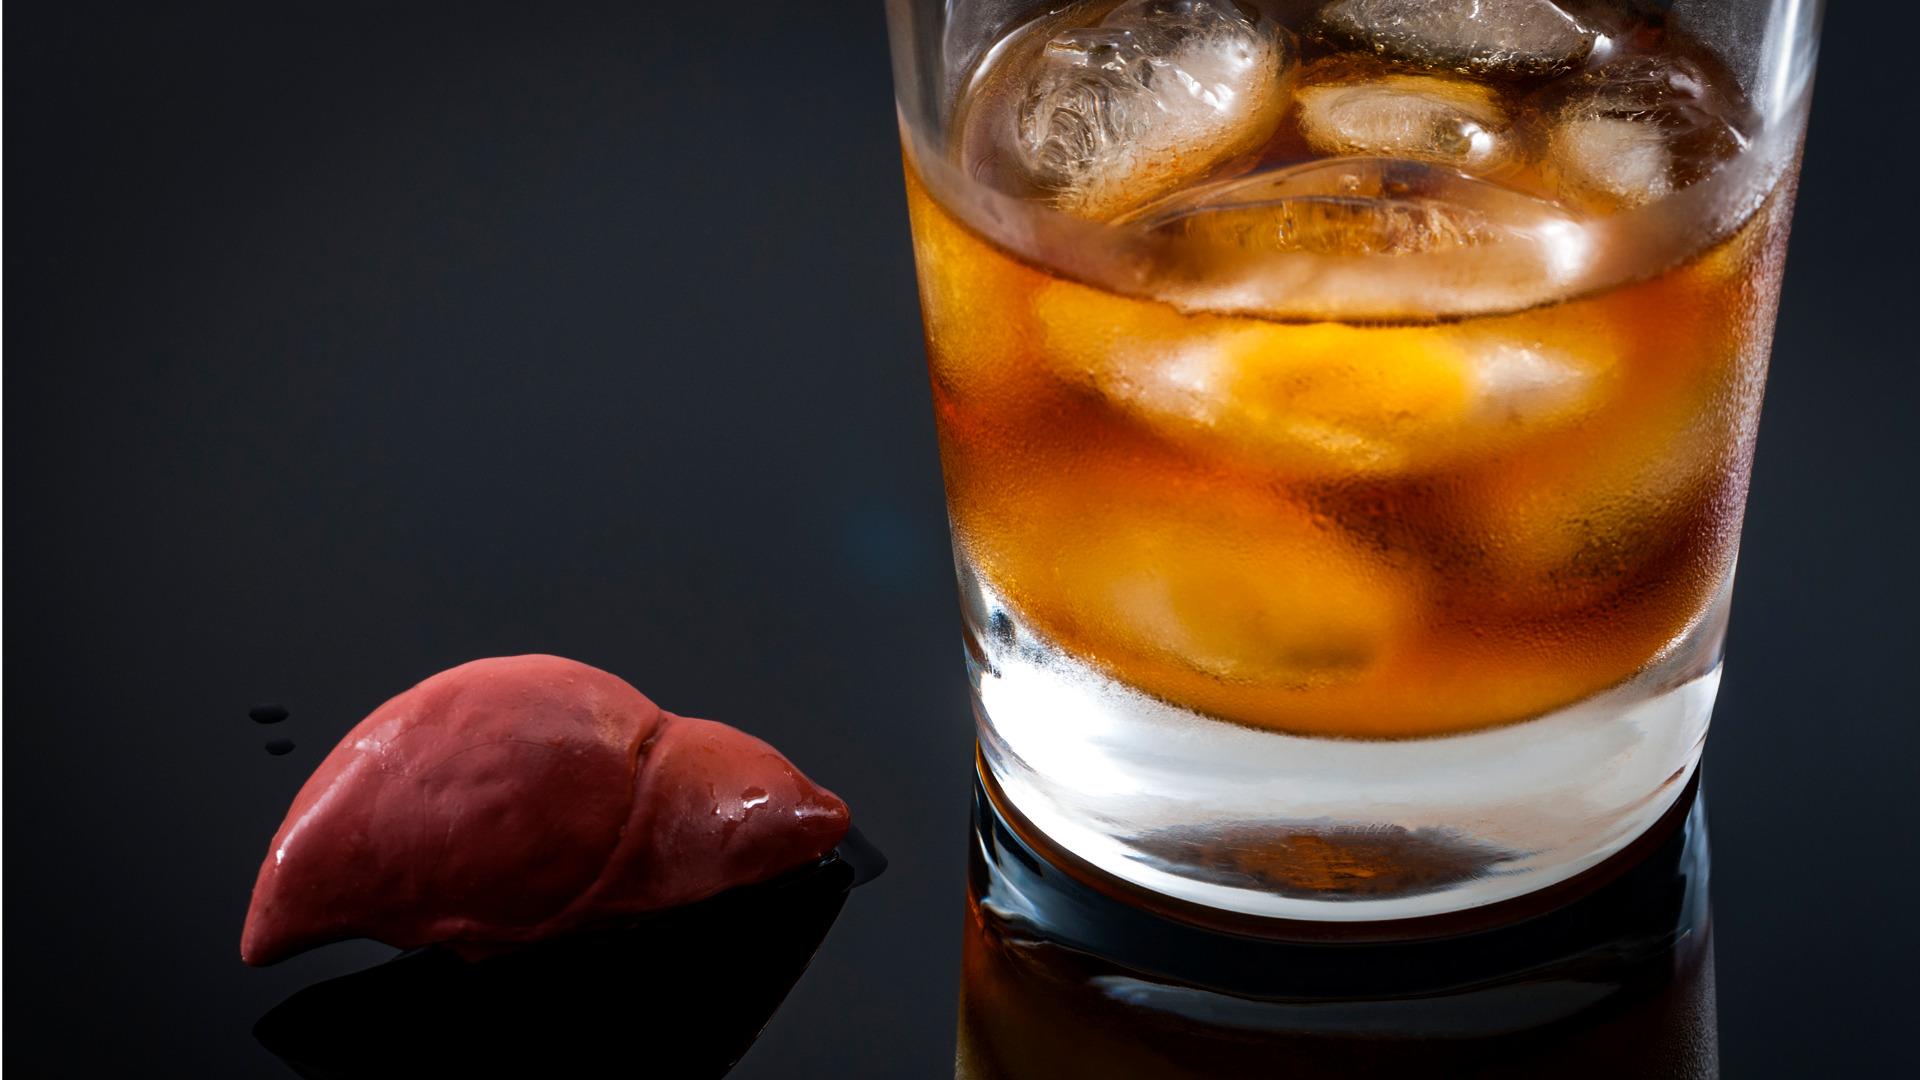 Trait#102: Alcohol metabolism and health (ALDH2)